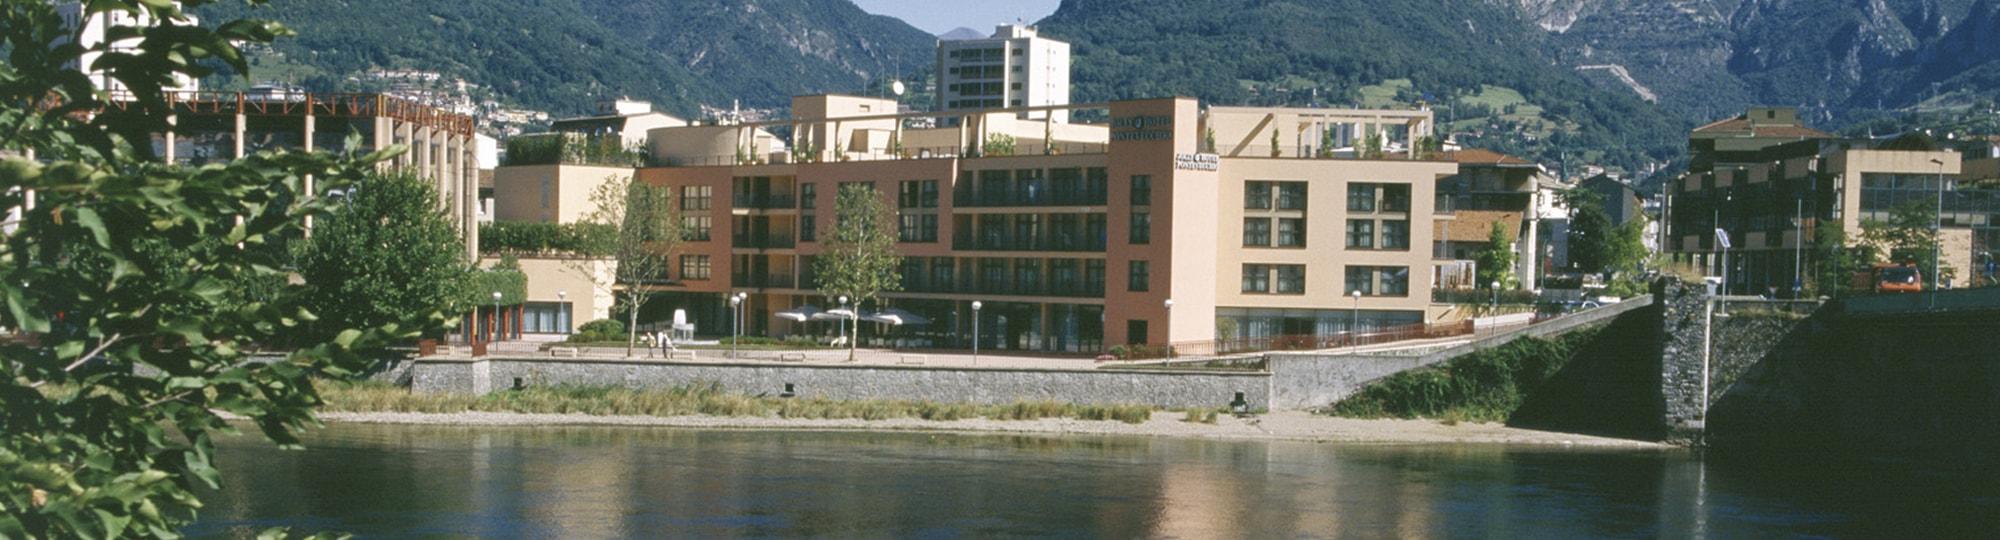 Vue de l'hotel Hotel NH Lecco Pontevecchio 4* à Lecco